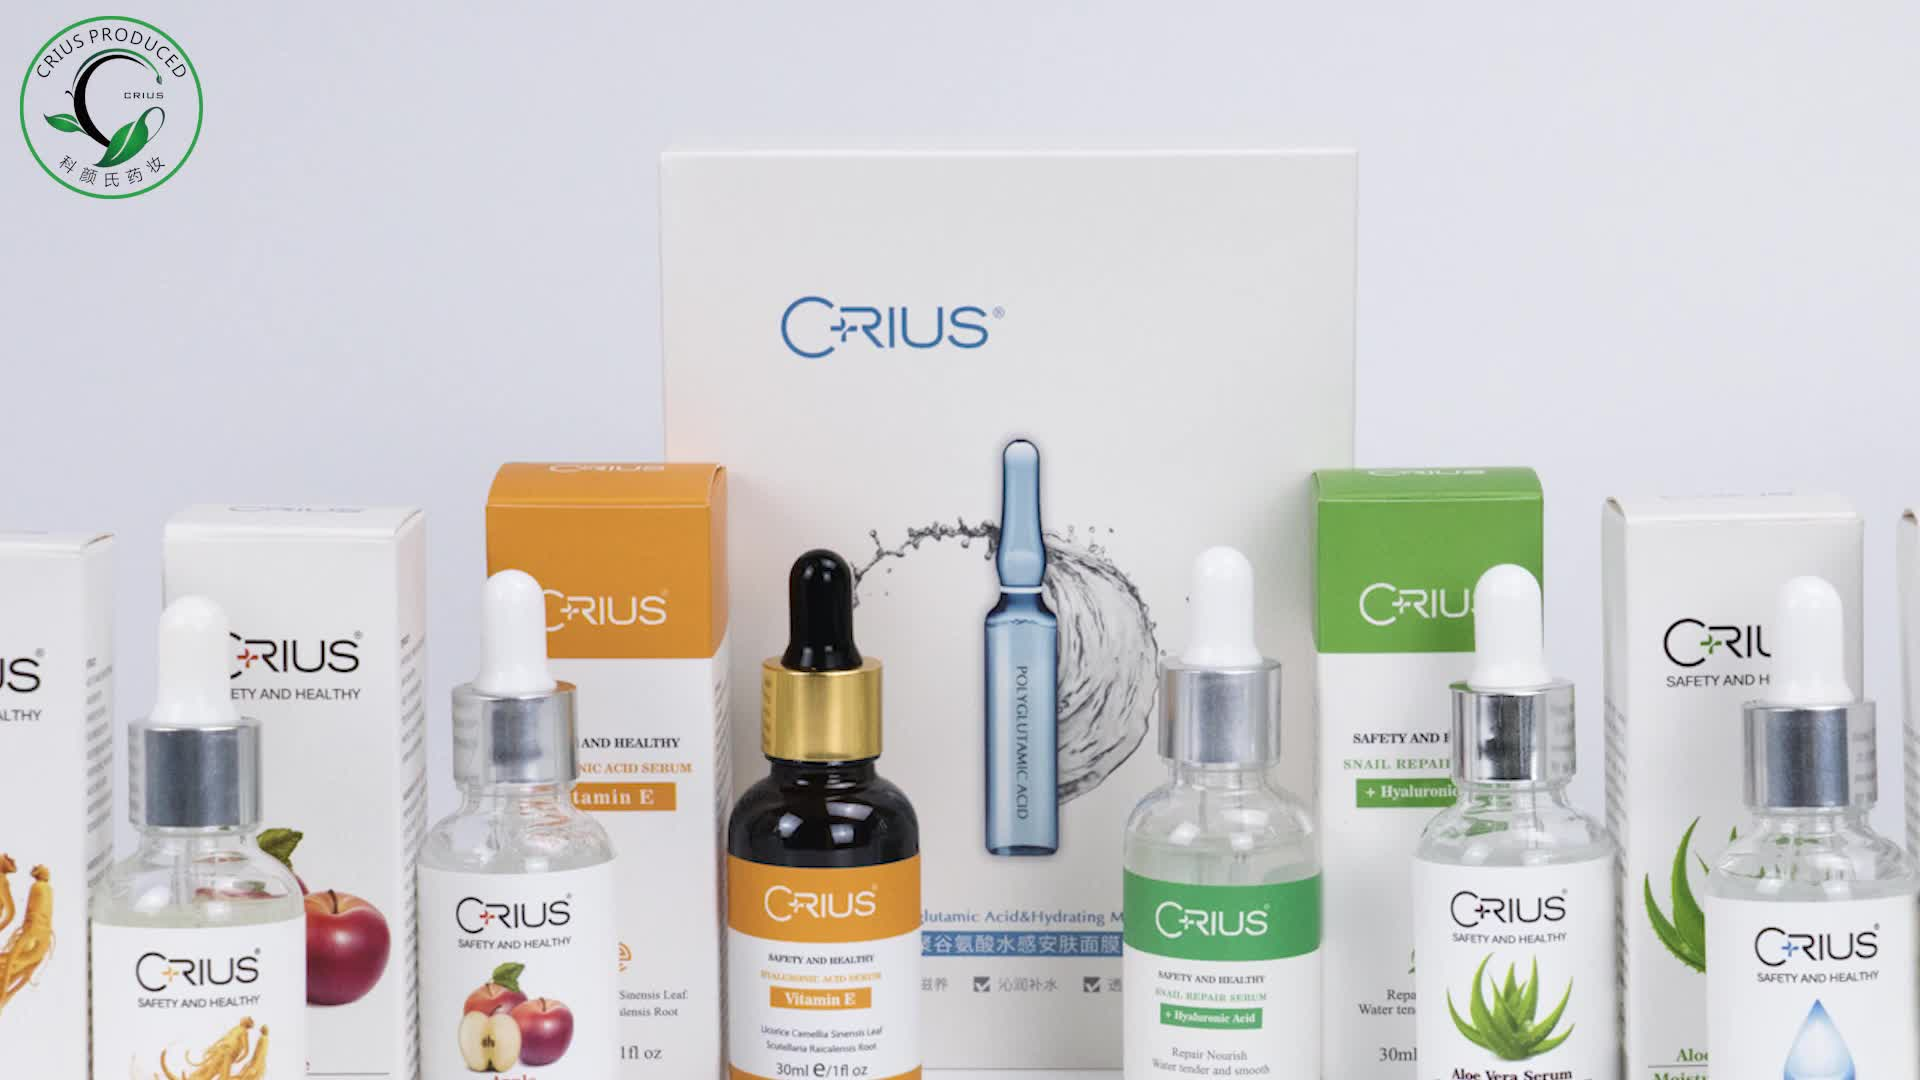 Groothandel Private Label anti aging Serum Whitening 2.5% Actieve Retinol Serum